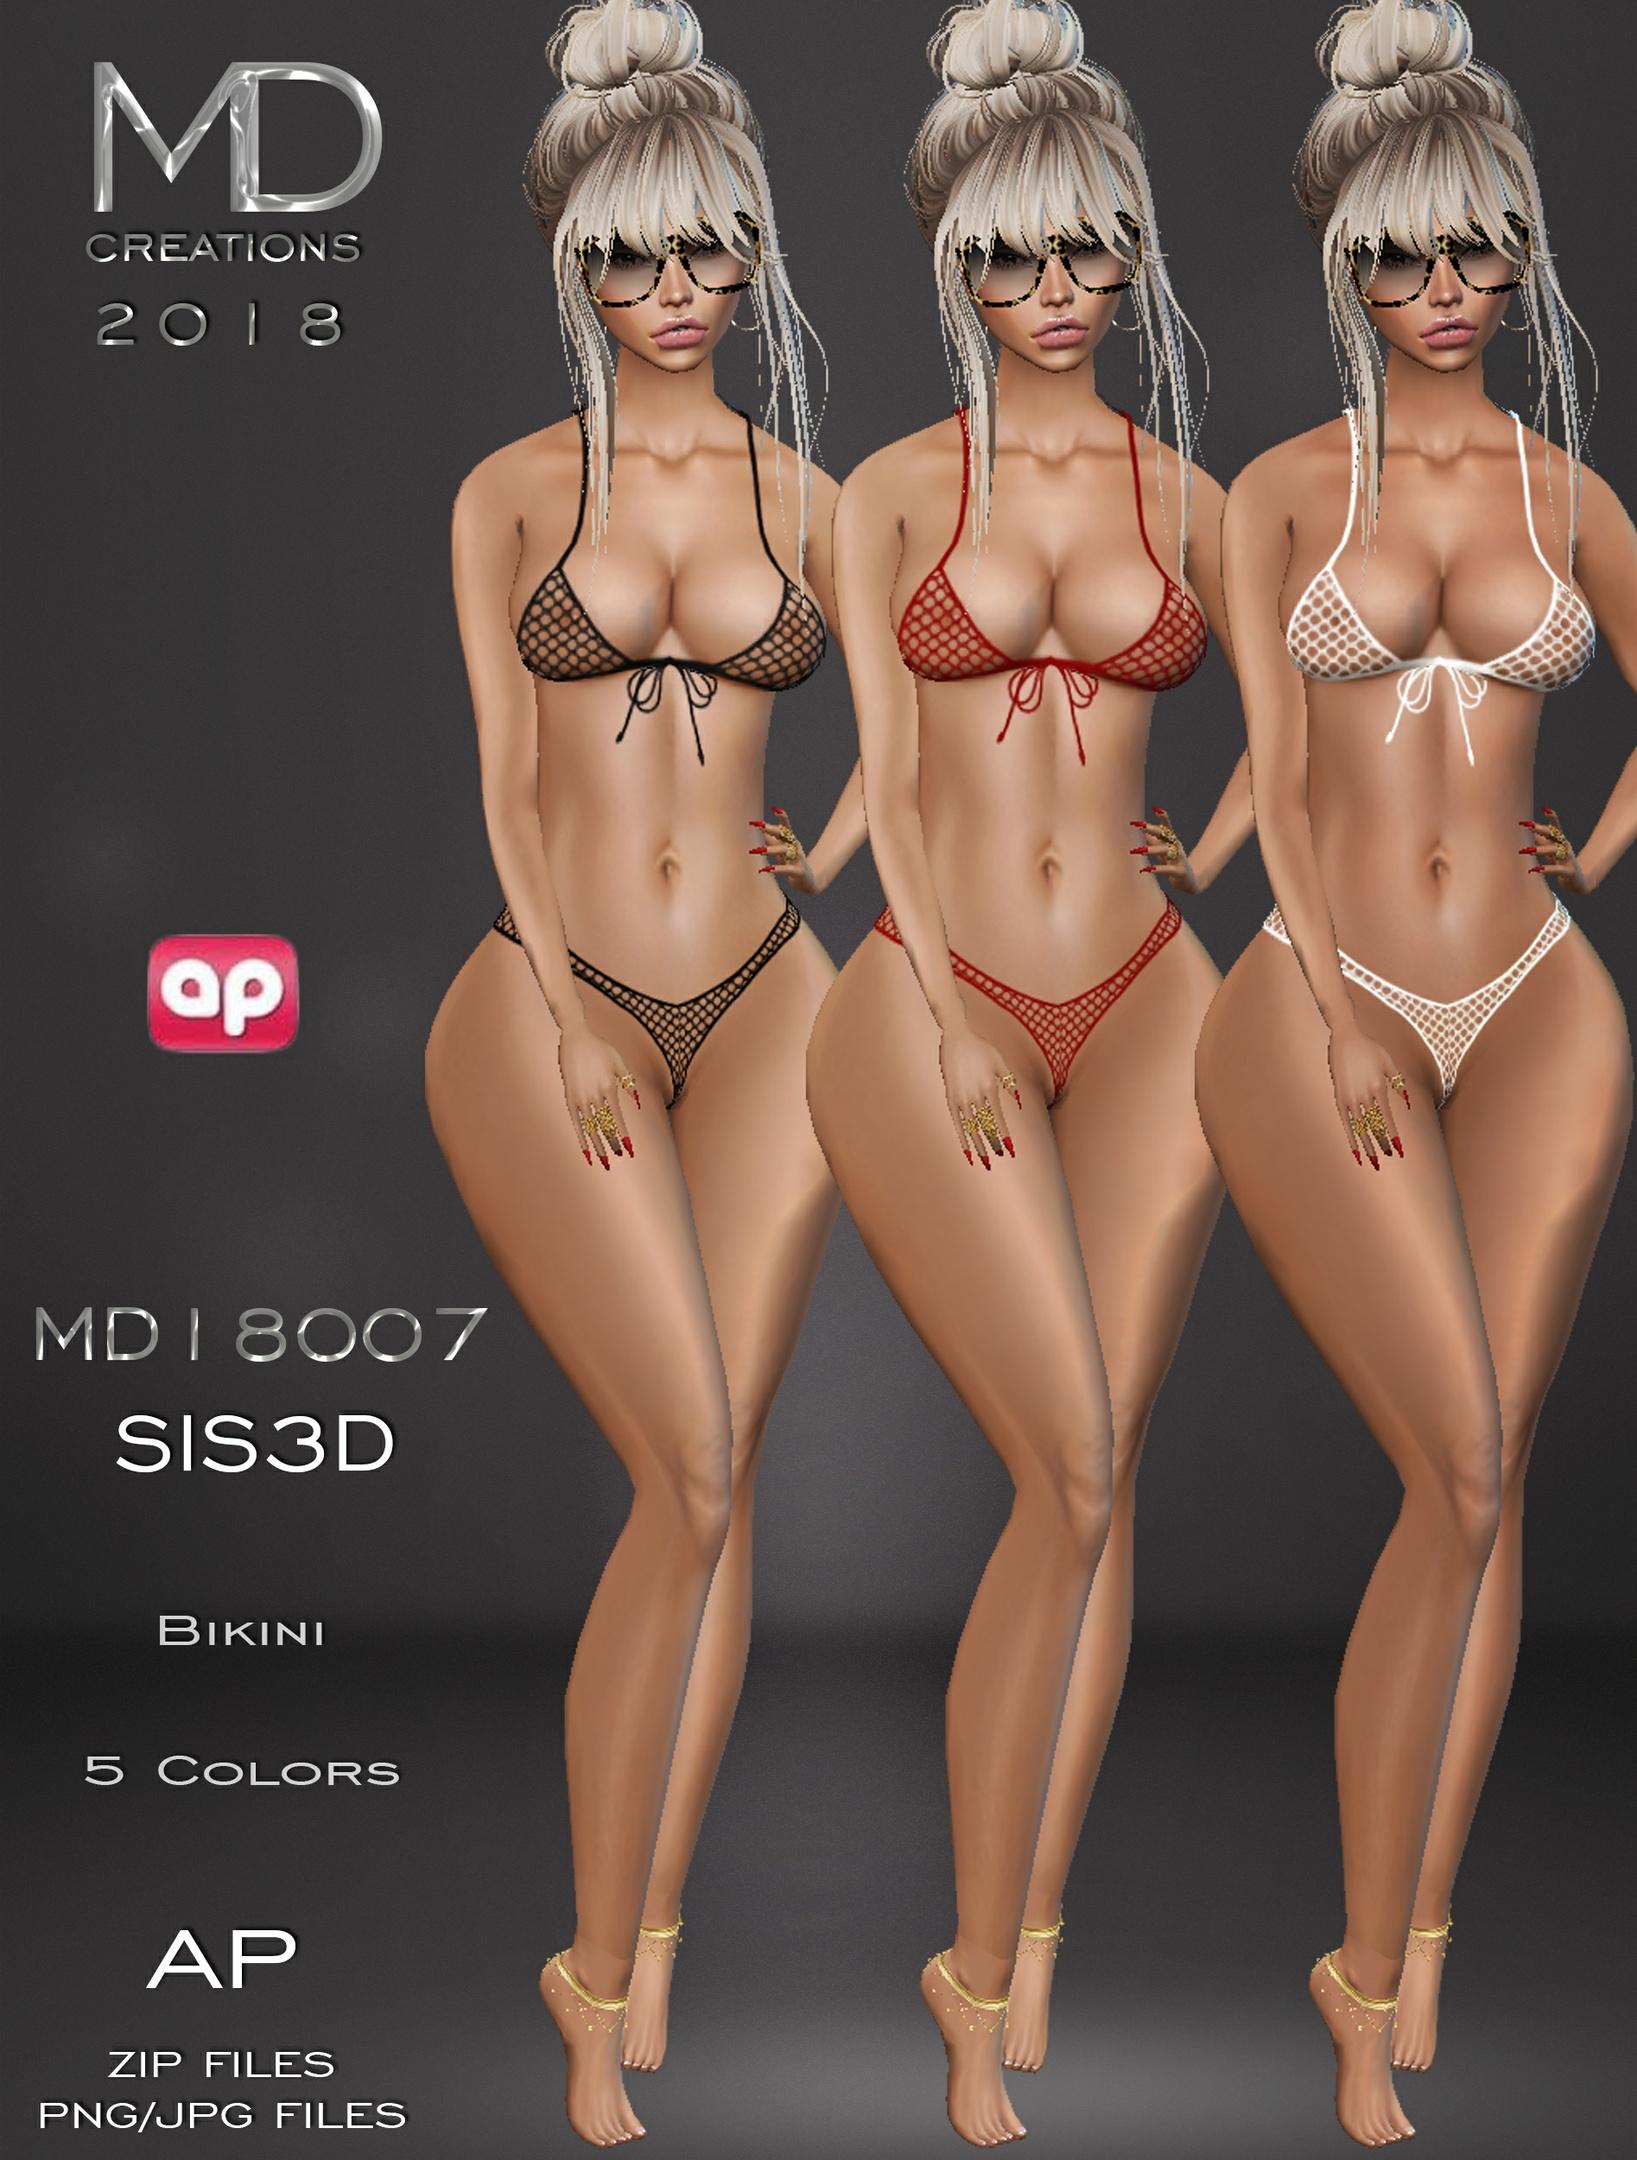 MD18007 - AP - SiS3D